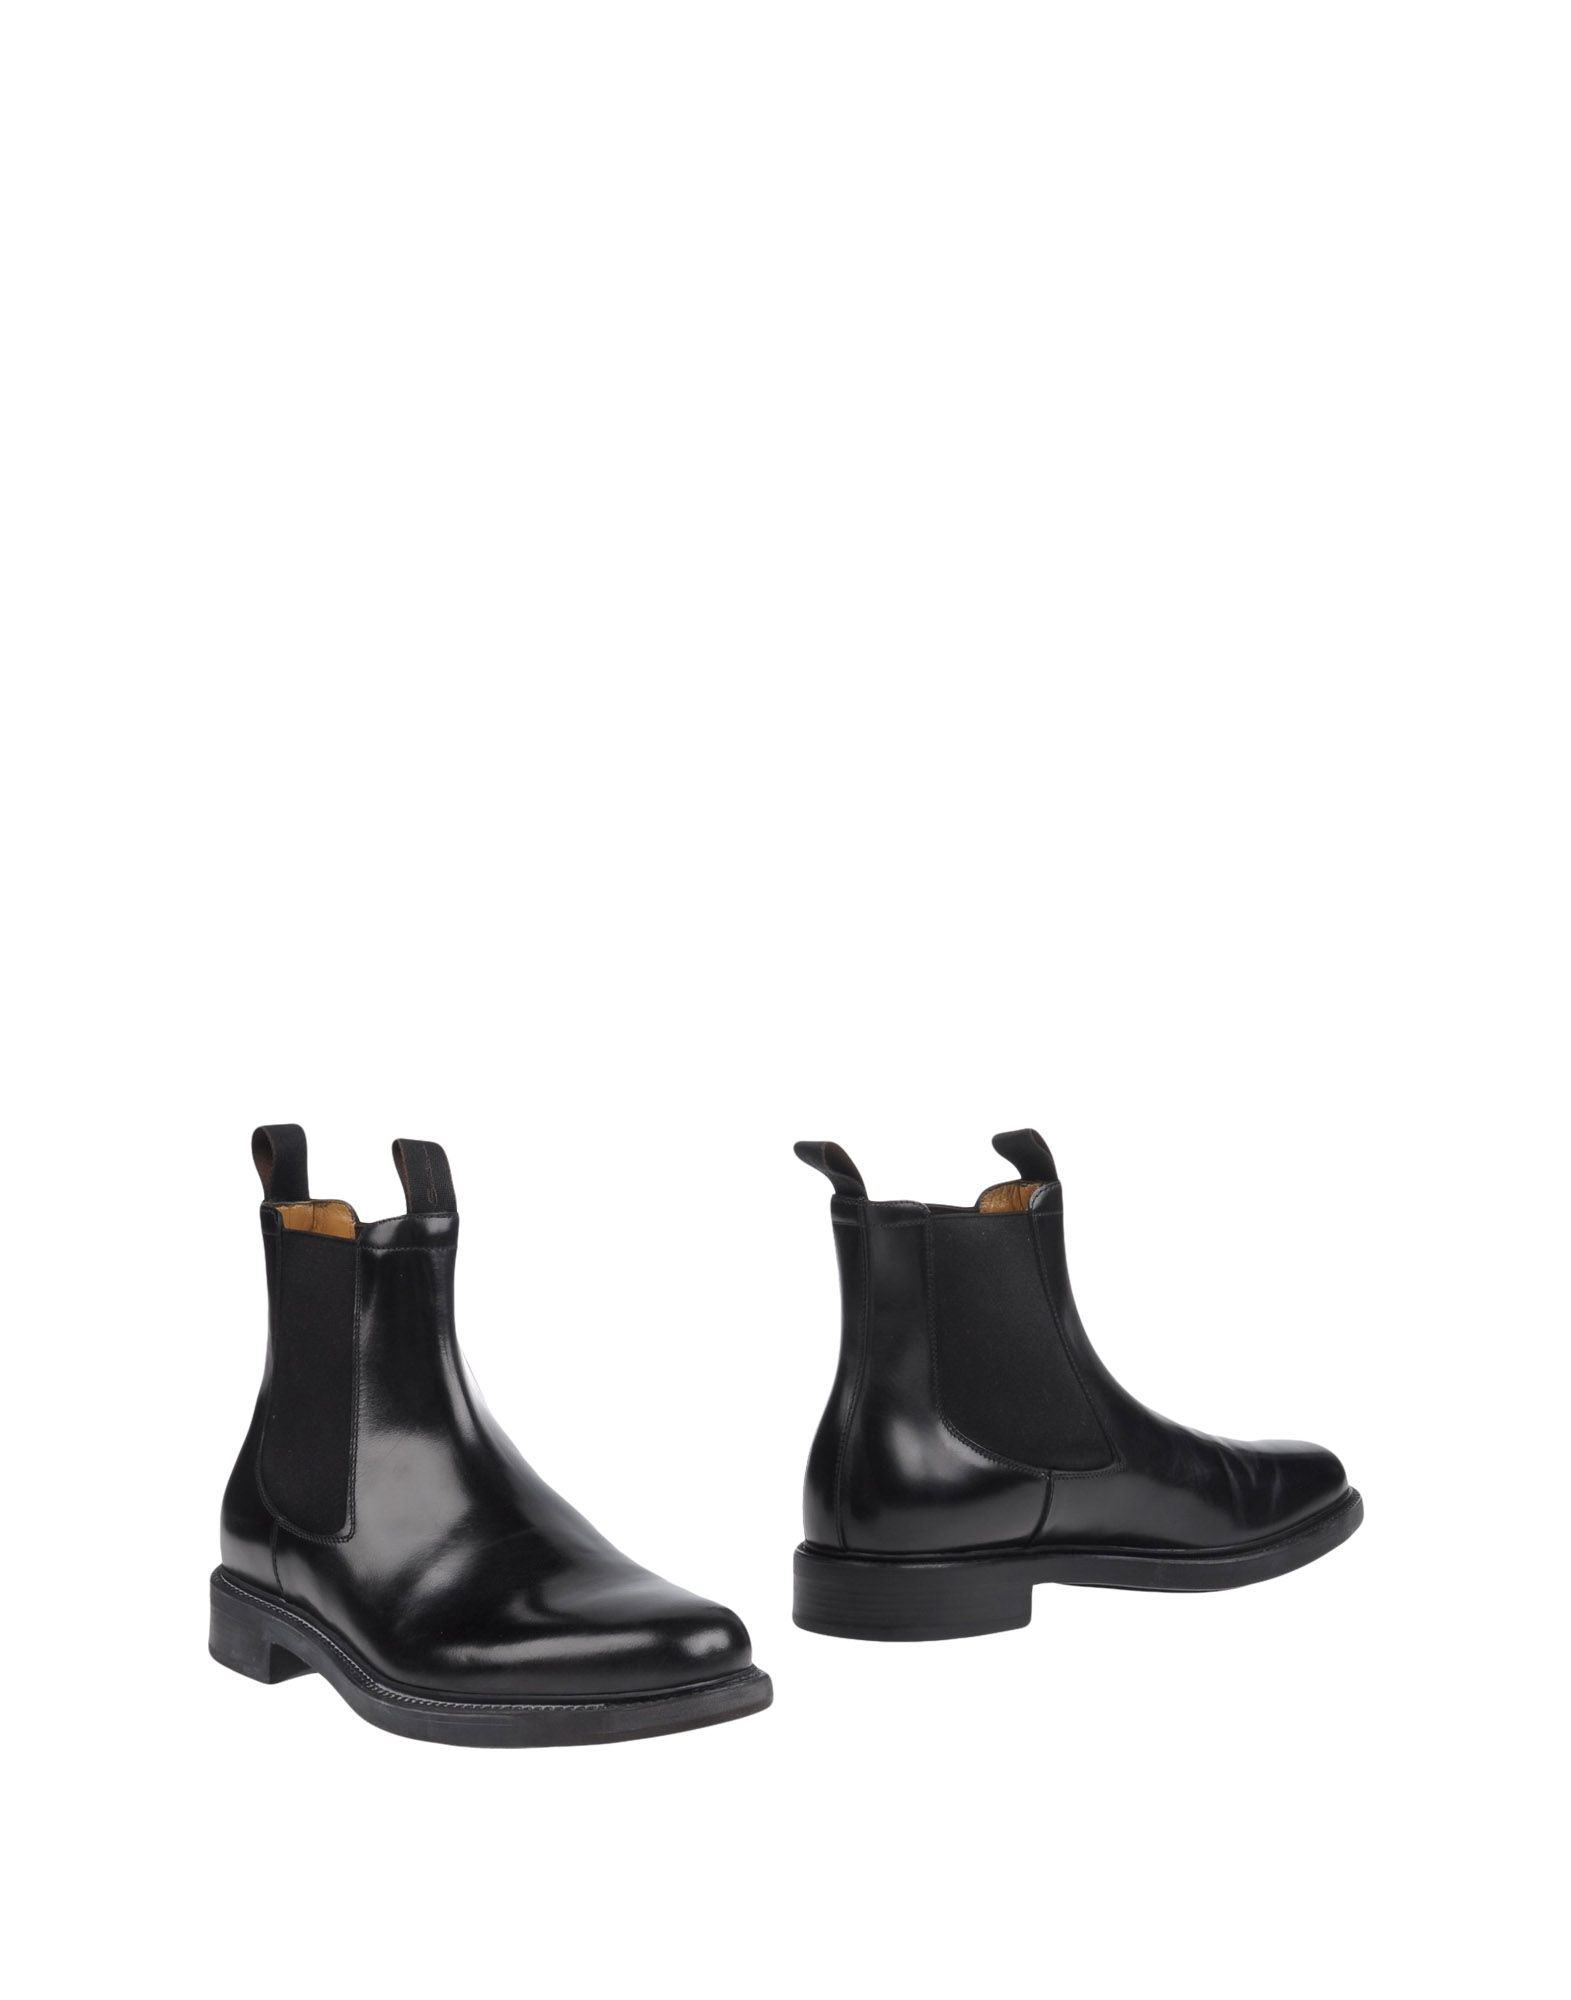 Santoni Boots - Men Men Men Santoni Boots online on  United Kingdom - 11195022CQ 7bc1c9